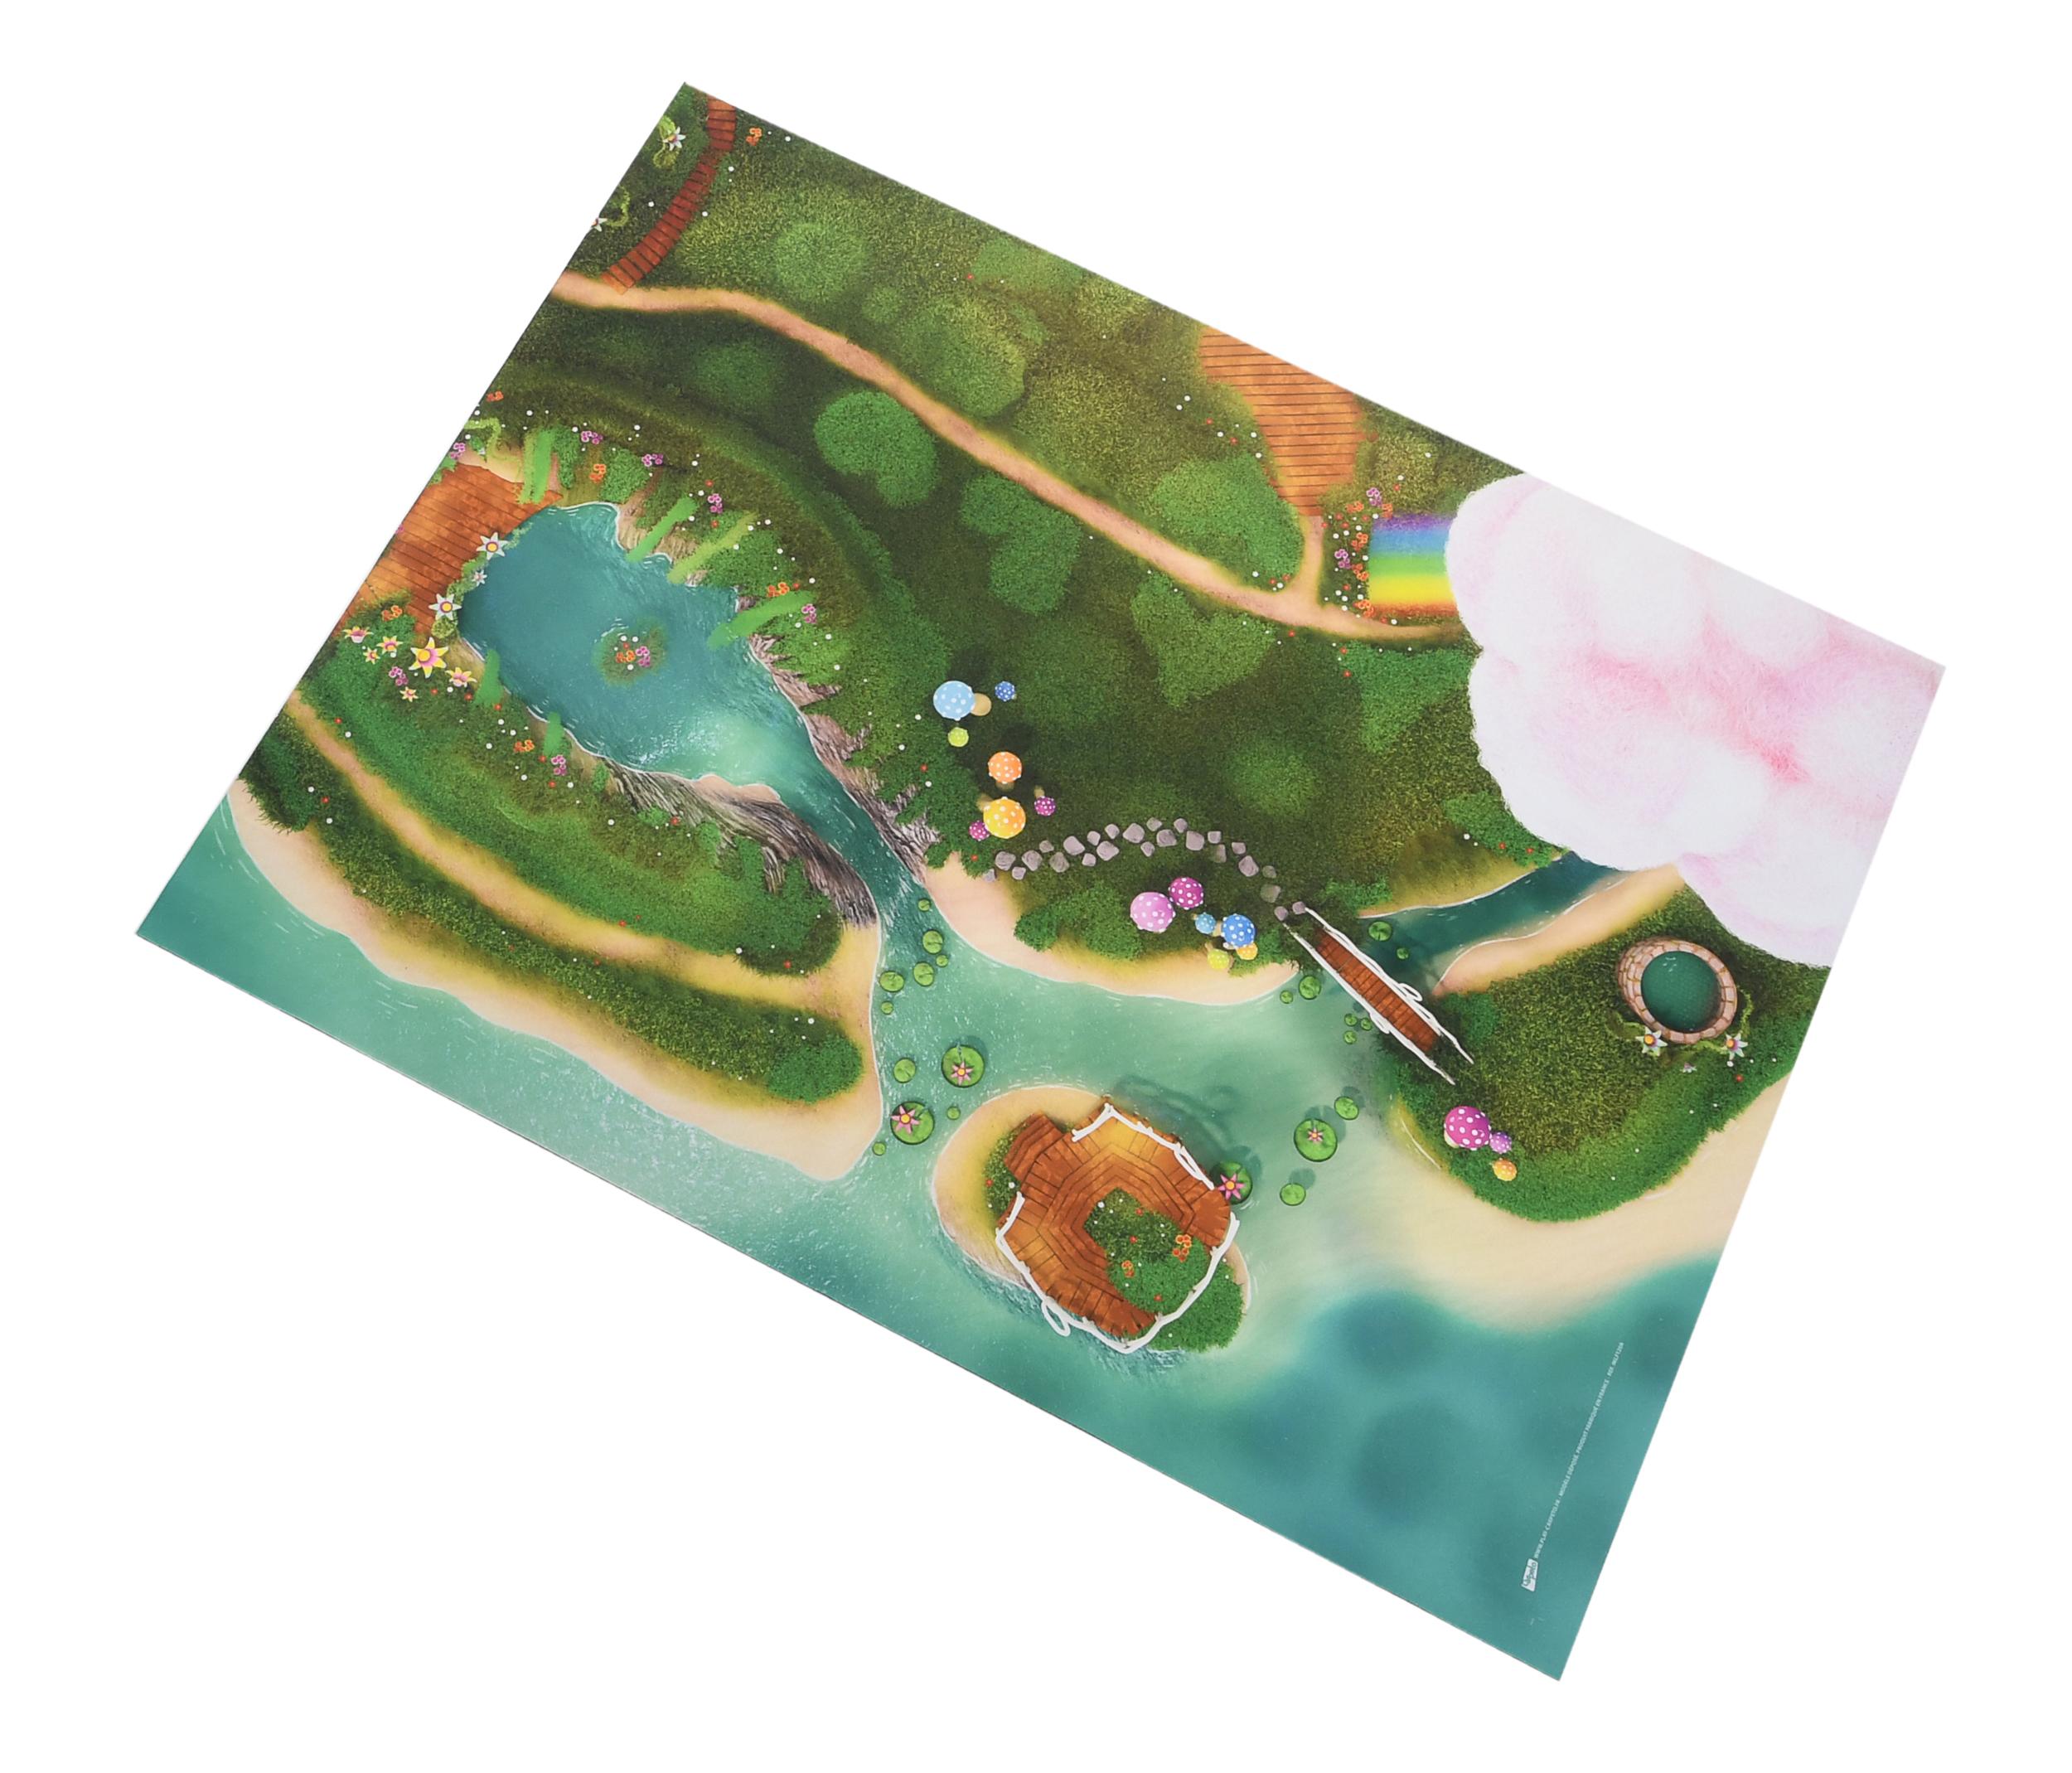 Middelgroot Speelkleed Carpeto - Sprookjes Lagune 120 x 90cm